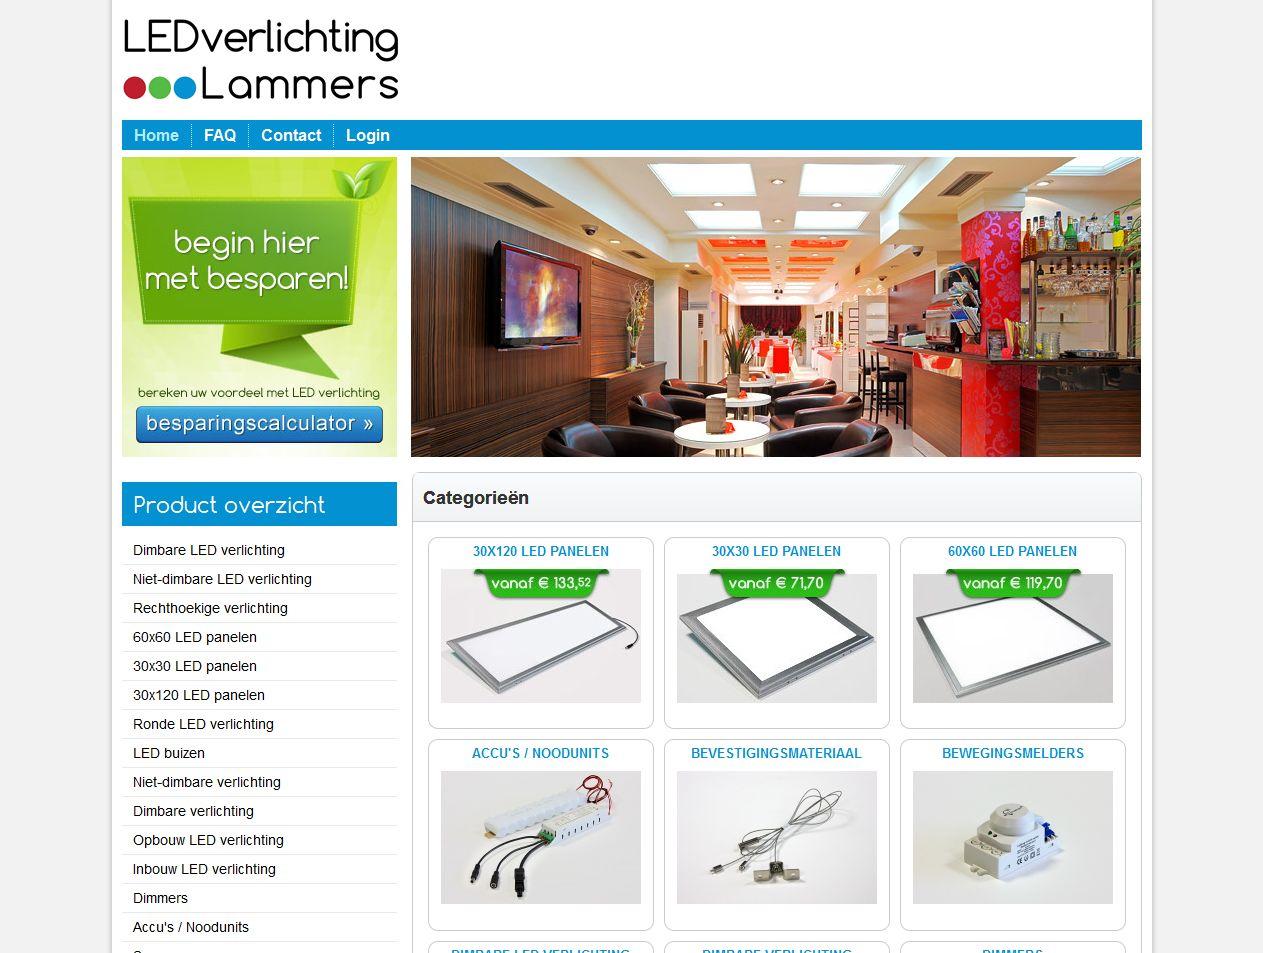 https://www.r2h.nl/images/blogs/Cases/webshop-ledverlichting-lammers-portfolio.jpg